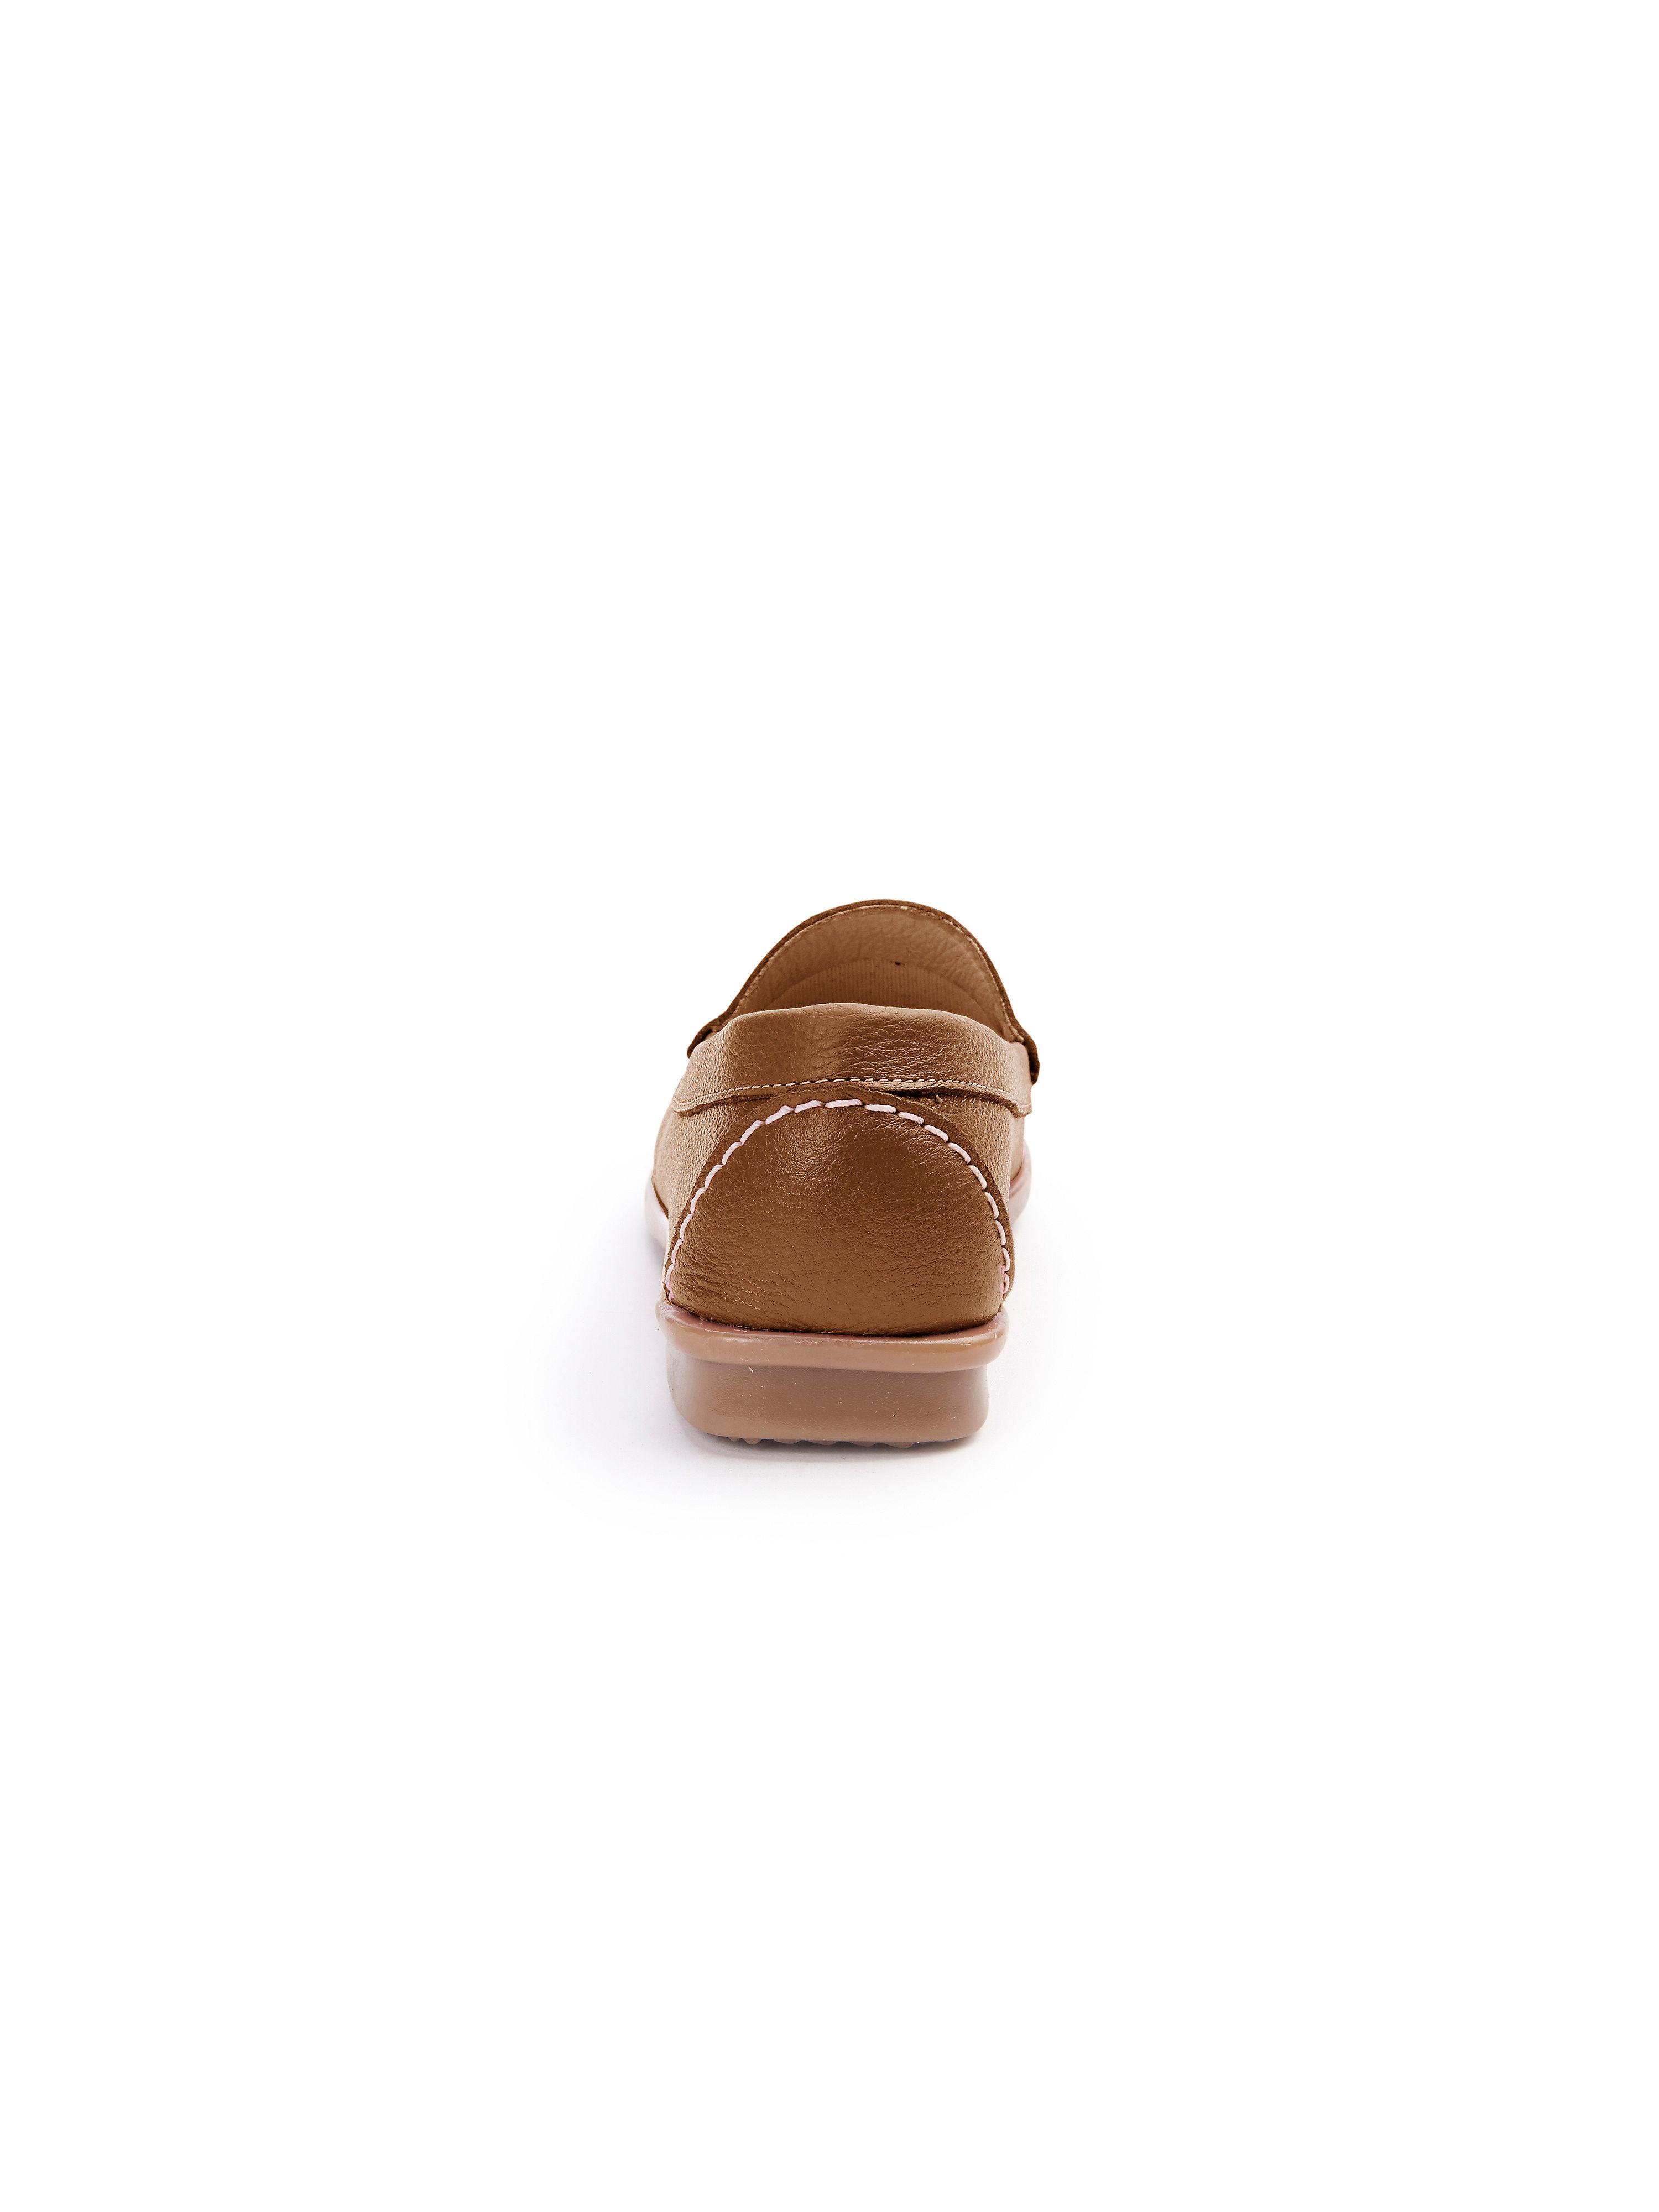 Peter Hahn Gute - Mokassin aus 100% Leder - Camel Gute Hahn Qualität beliebte Schuhe 56ad52